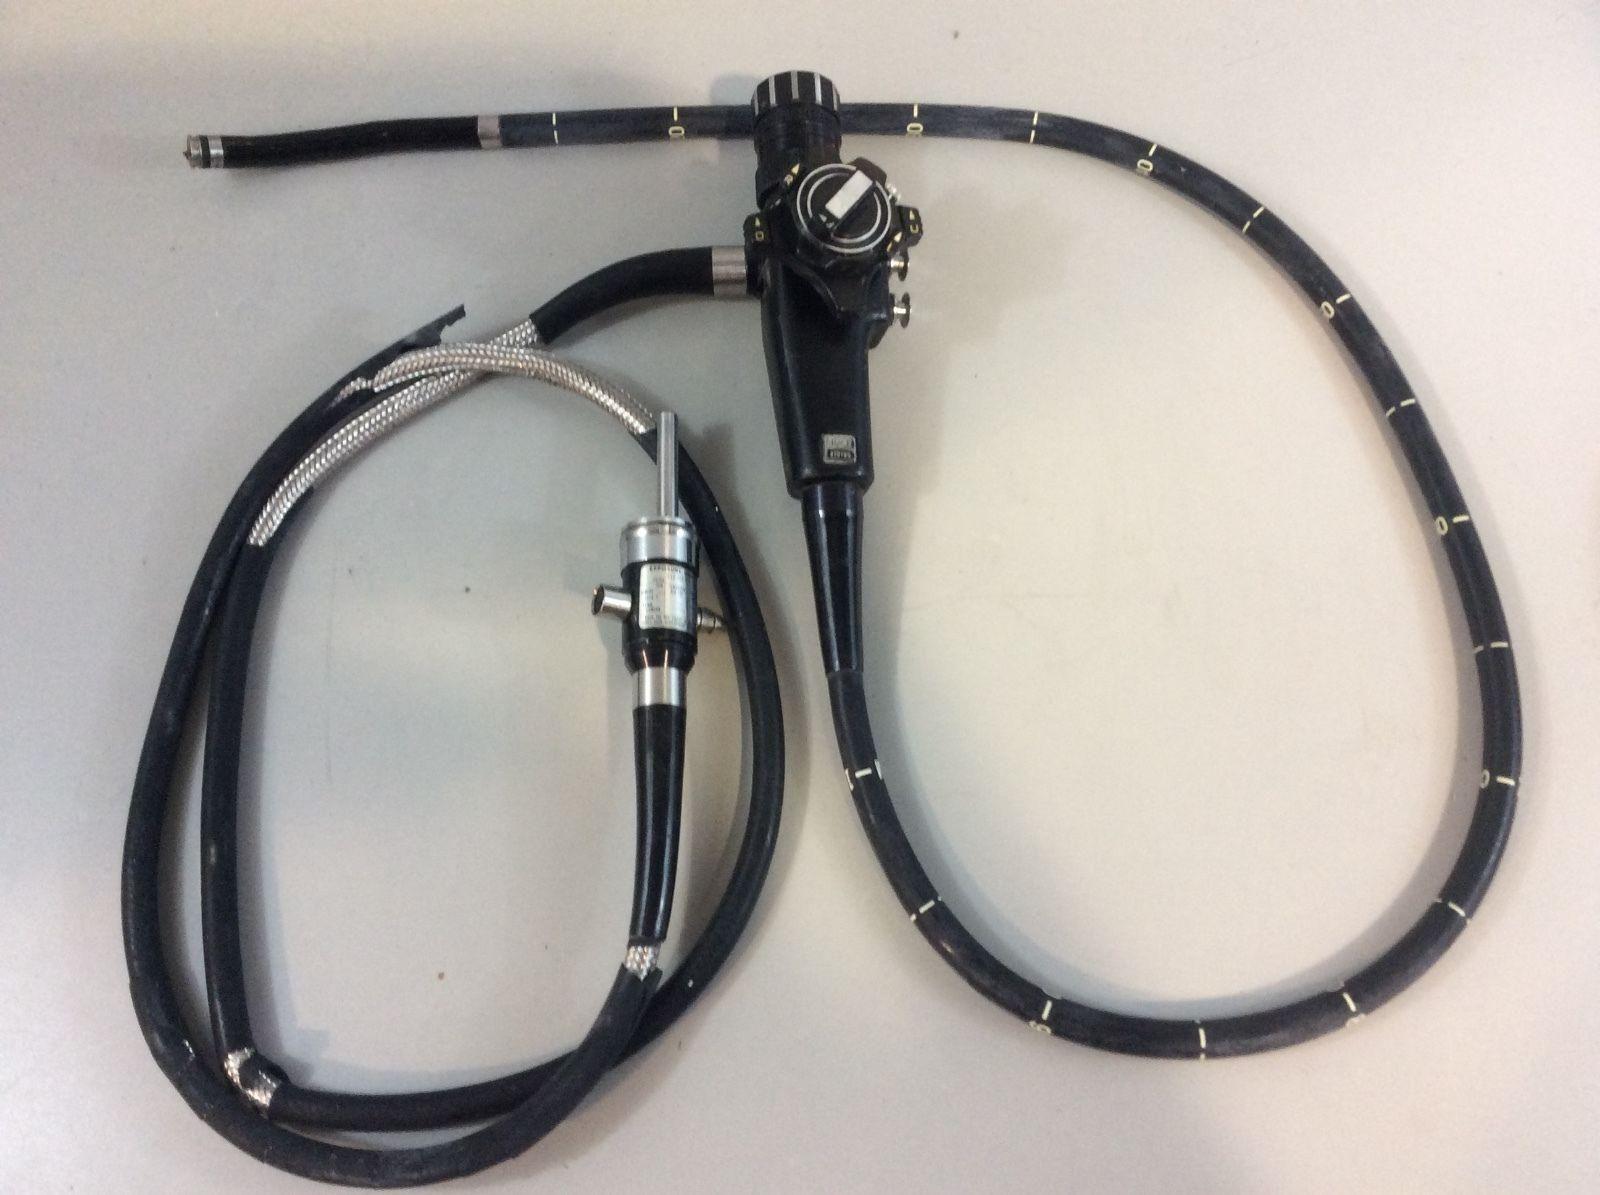 Olympus GIF-D2 Gastroscope, Medical, Healthcare, Endoscopy Equipment